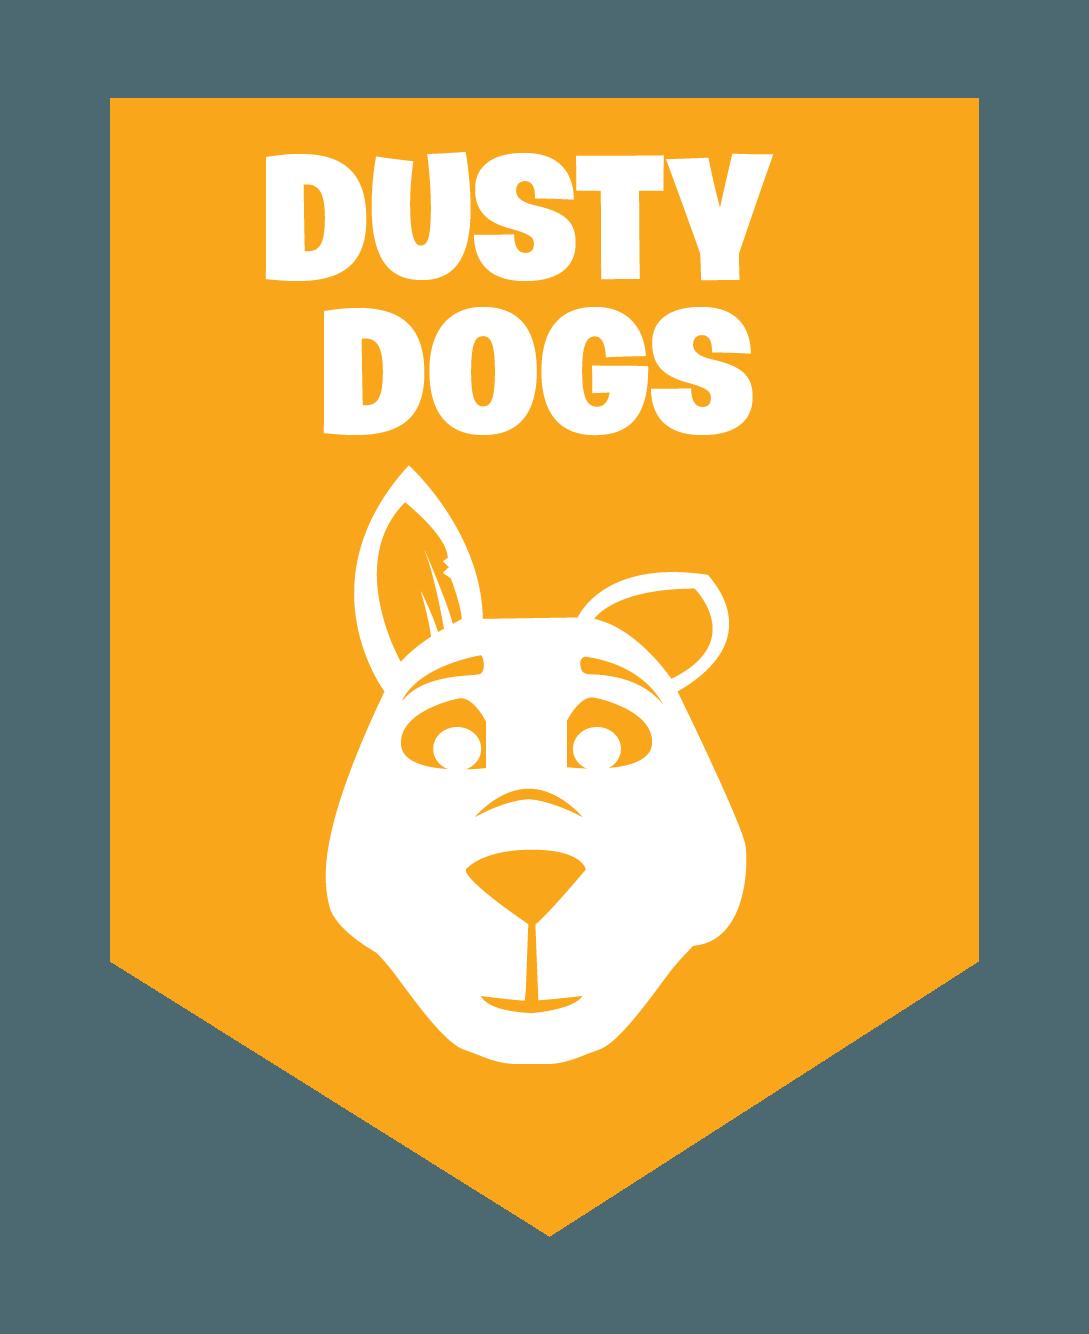 DustyDogs.png